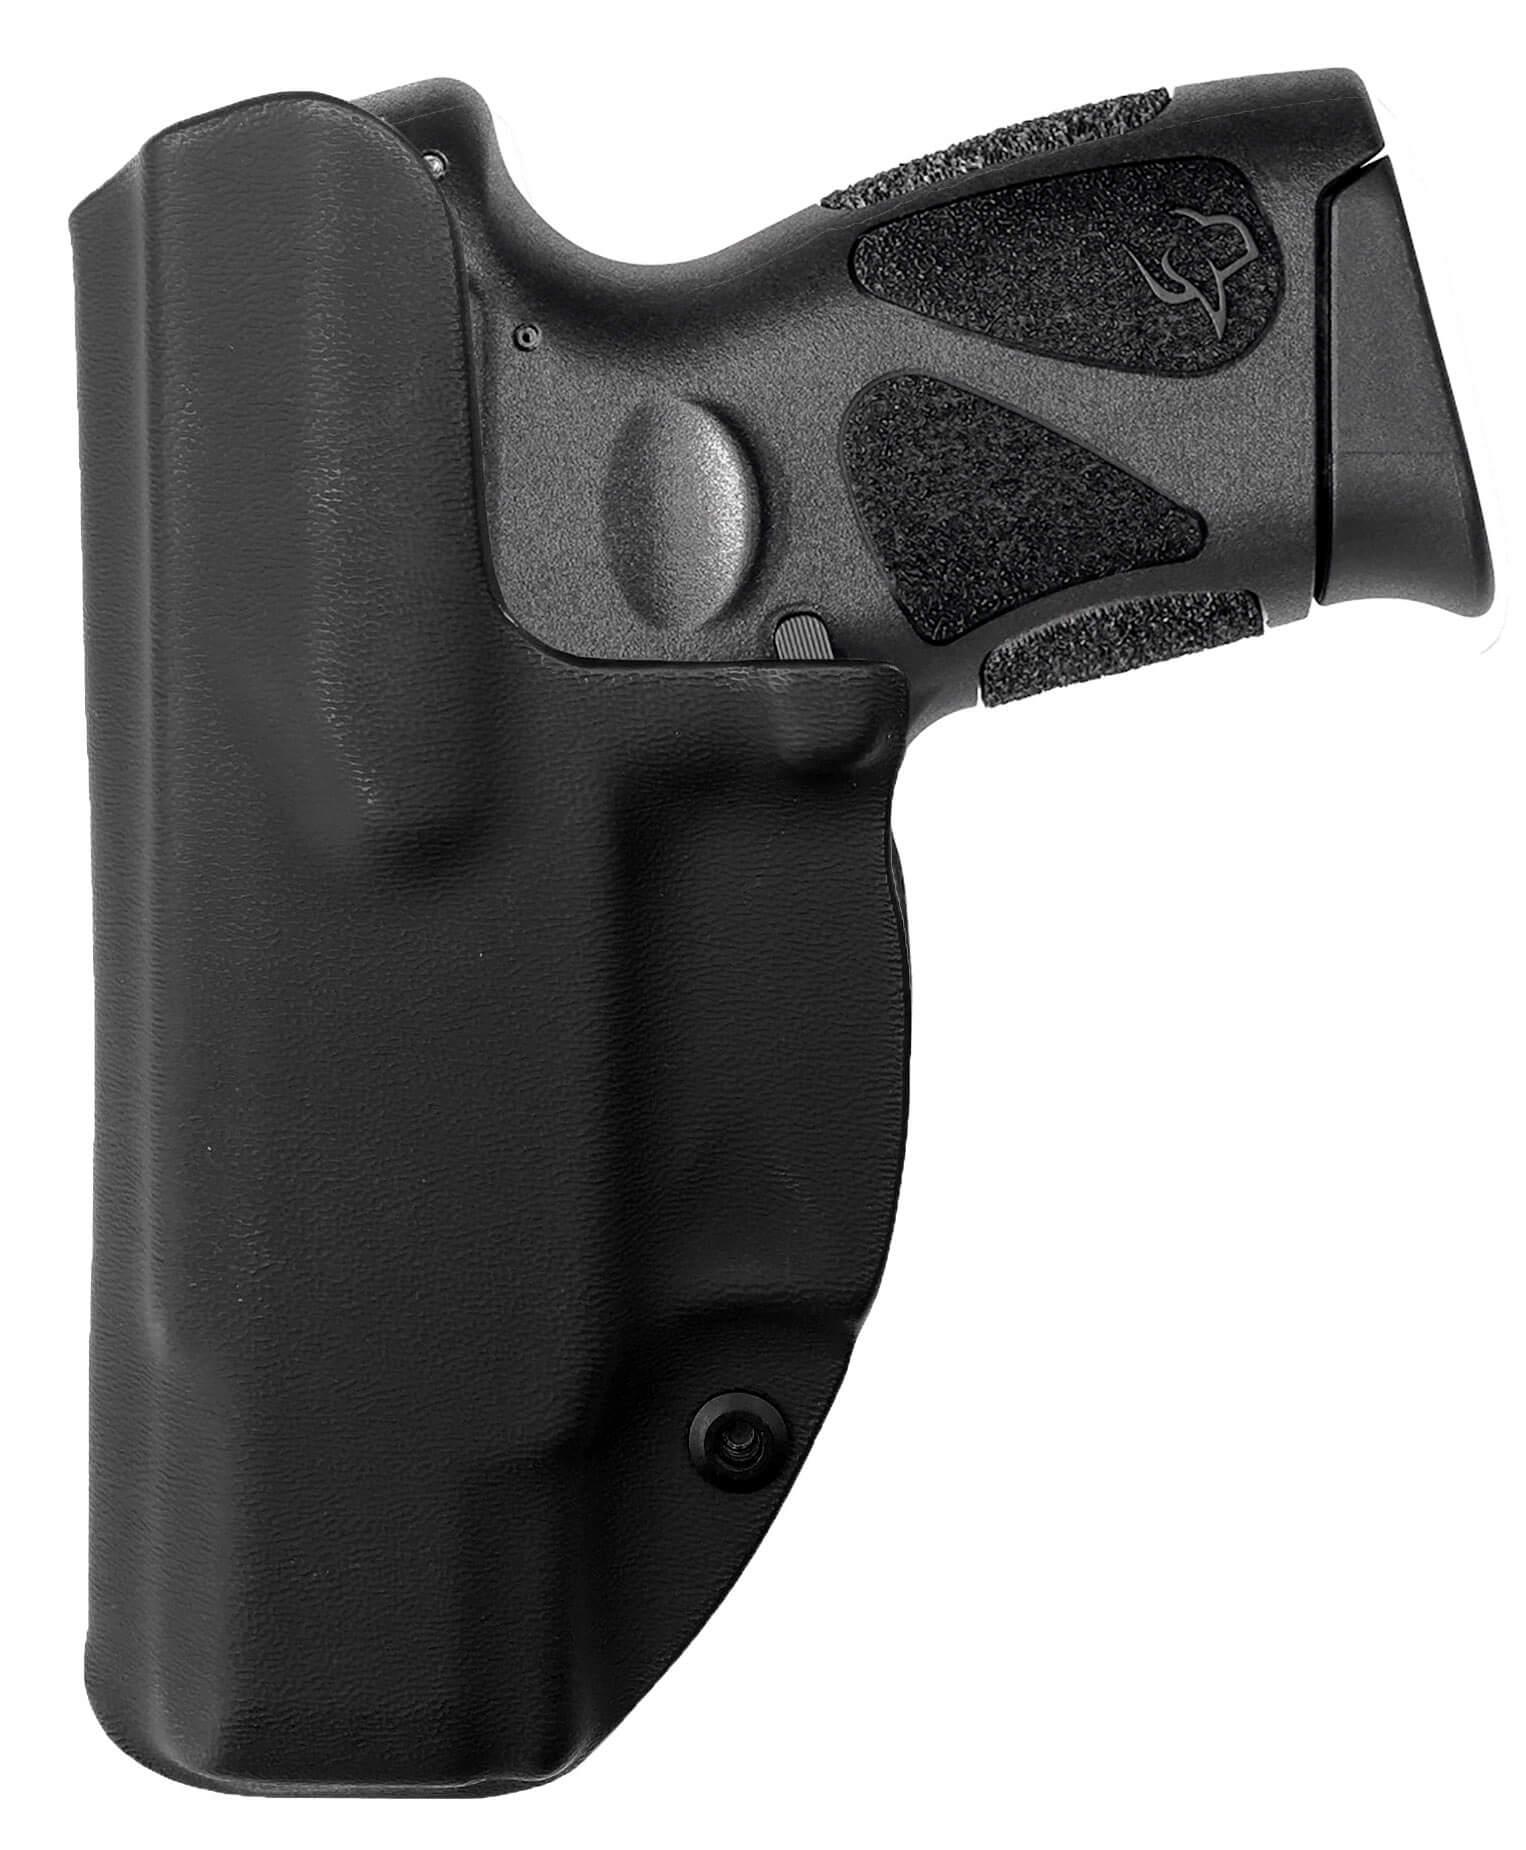 Coldre [G2c] 9mm Kydex Slim + Porta-Carregador Saque Rápido Velado Kydex® 080